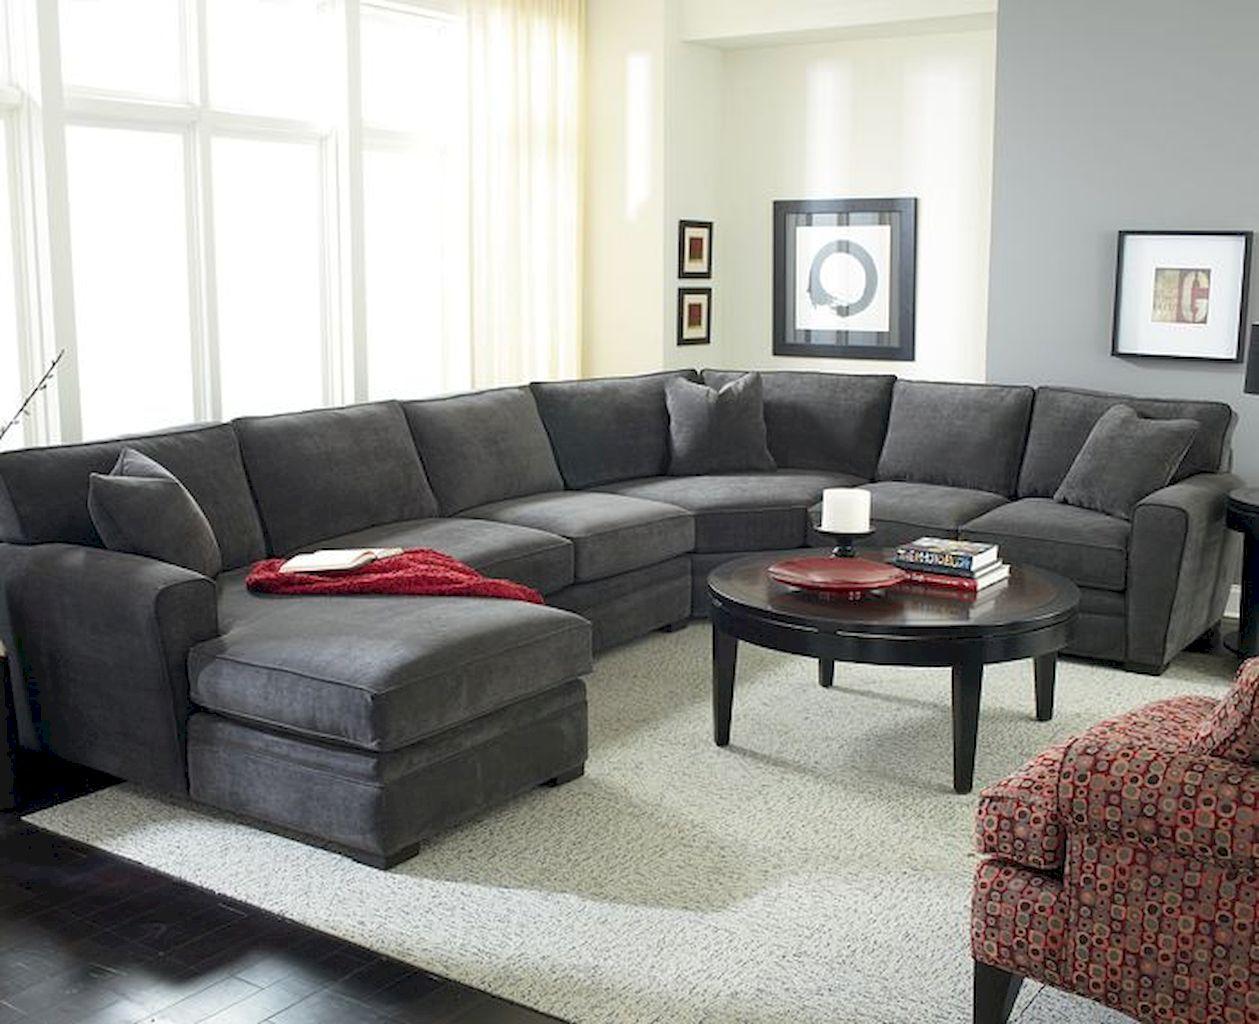 apposite living room furniture for an impressive home living room rh pinterest com